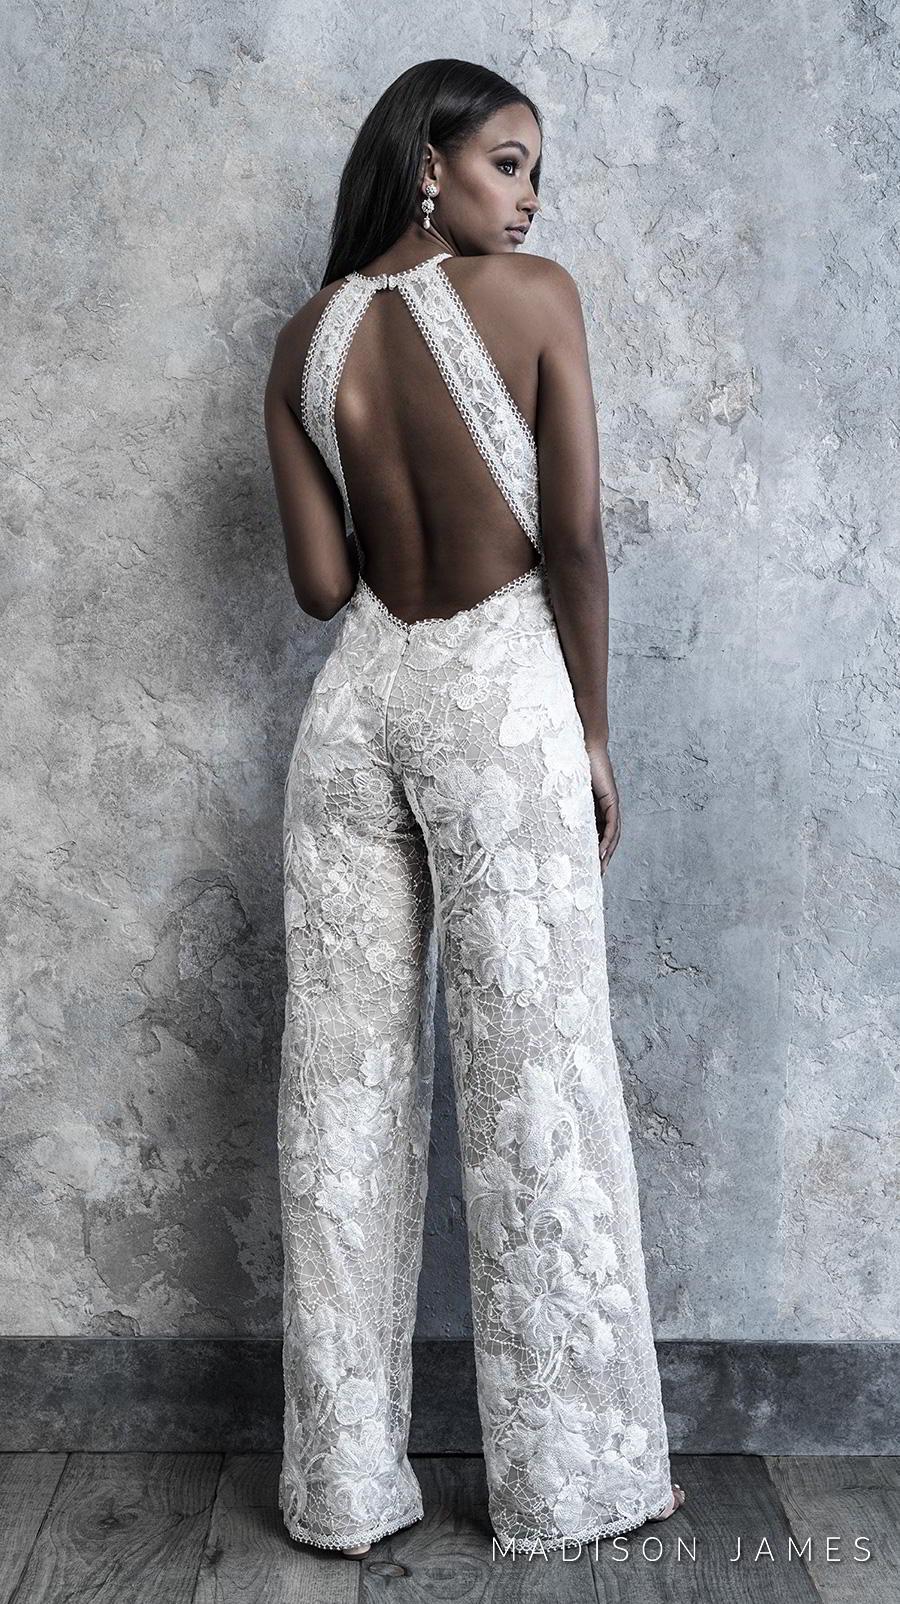 madison james 2019 bridal sleeveless halter neck full embellishment modern sophiscated jumpsuit wedding dress low keyhole back (500) bv